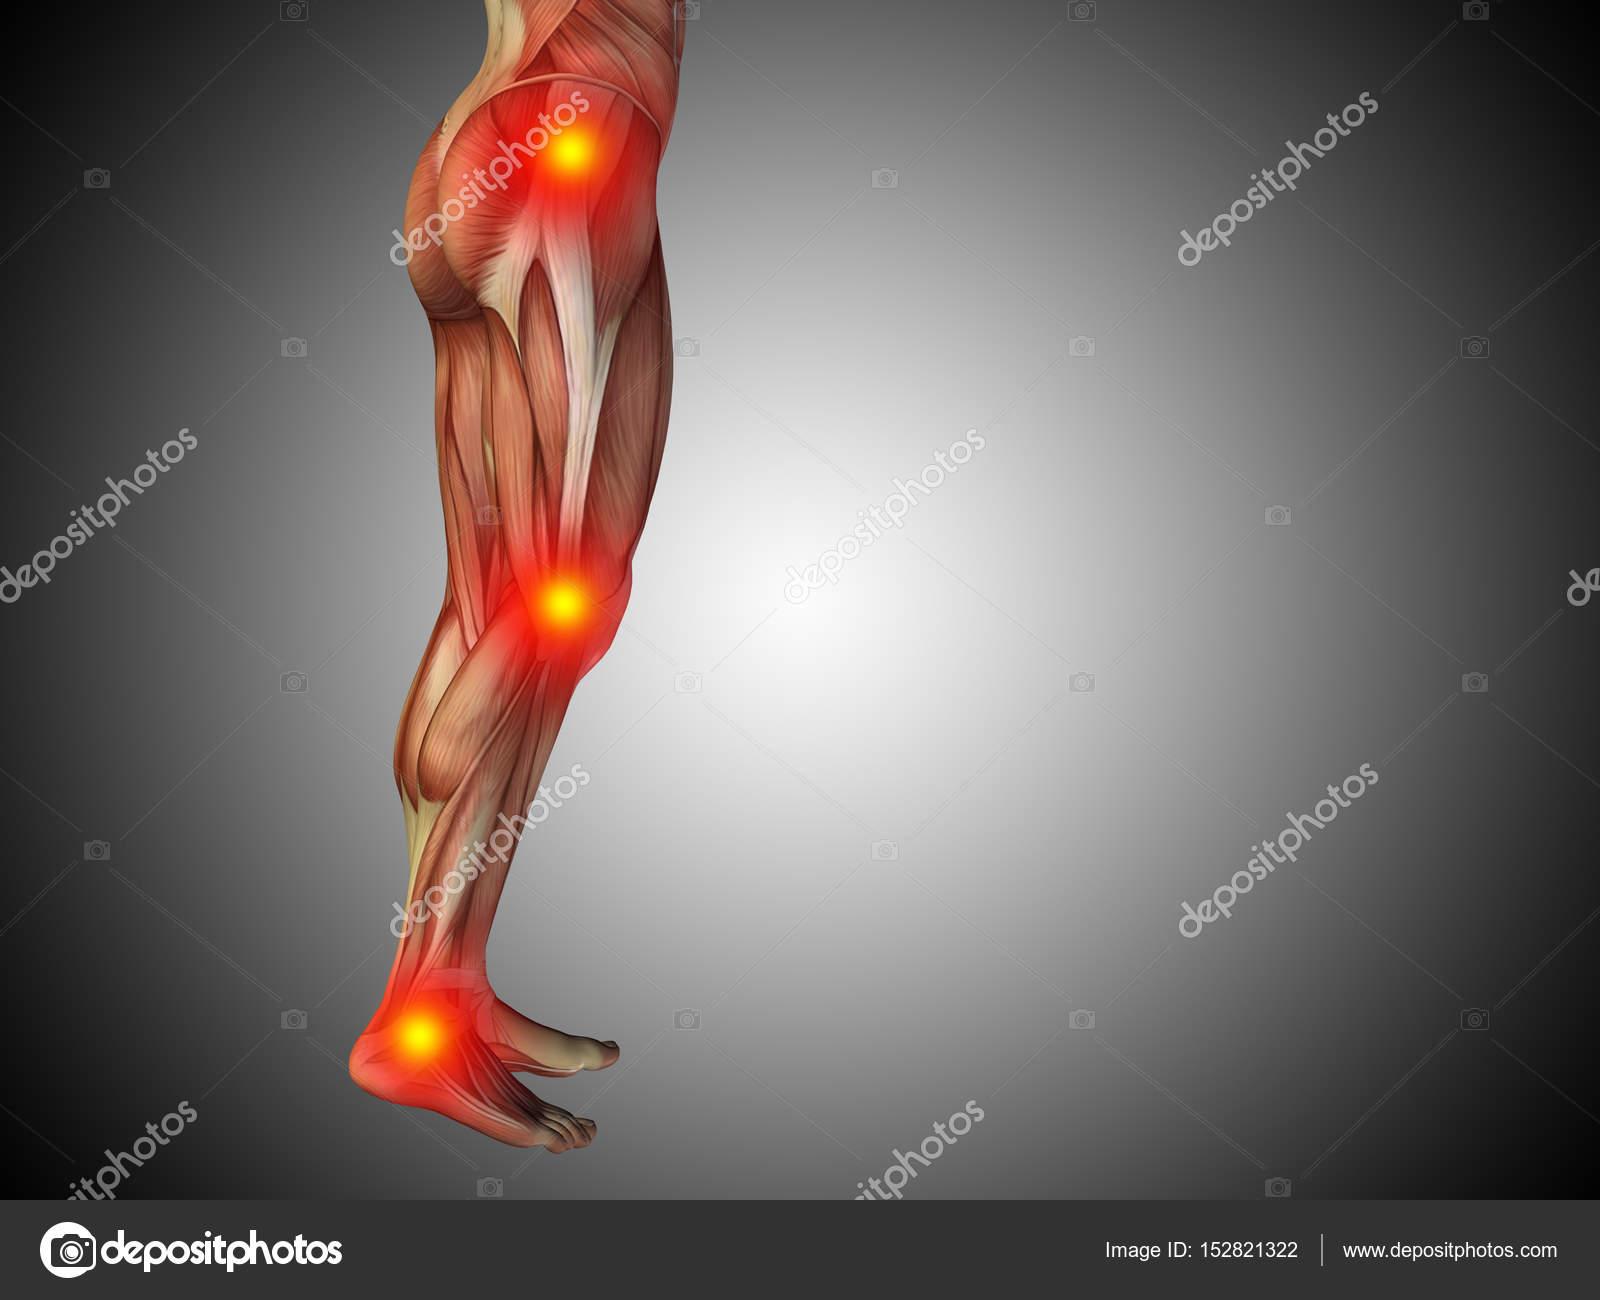 Human Lower Body Anatomy Stock Photo Design36 152821322